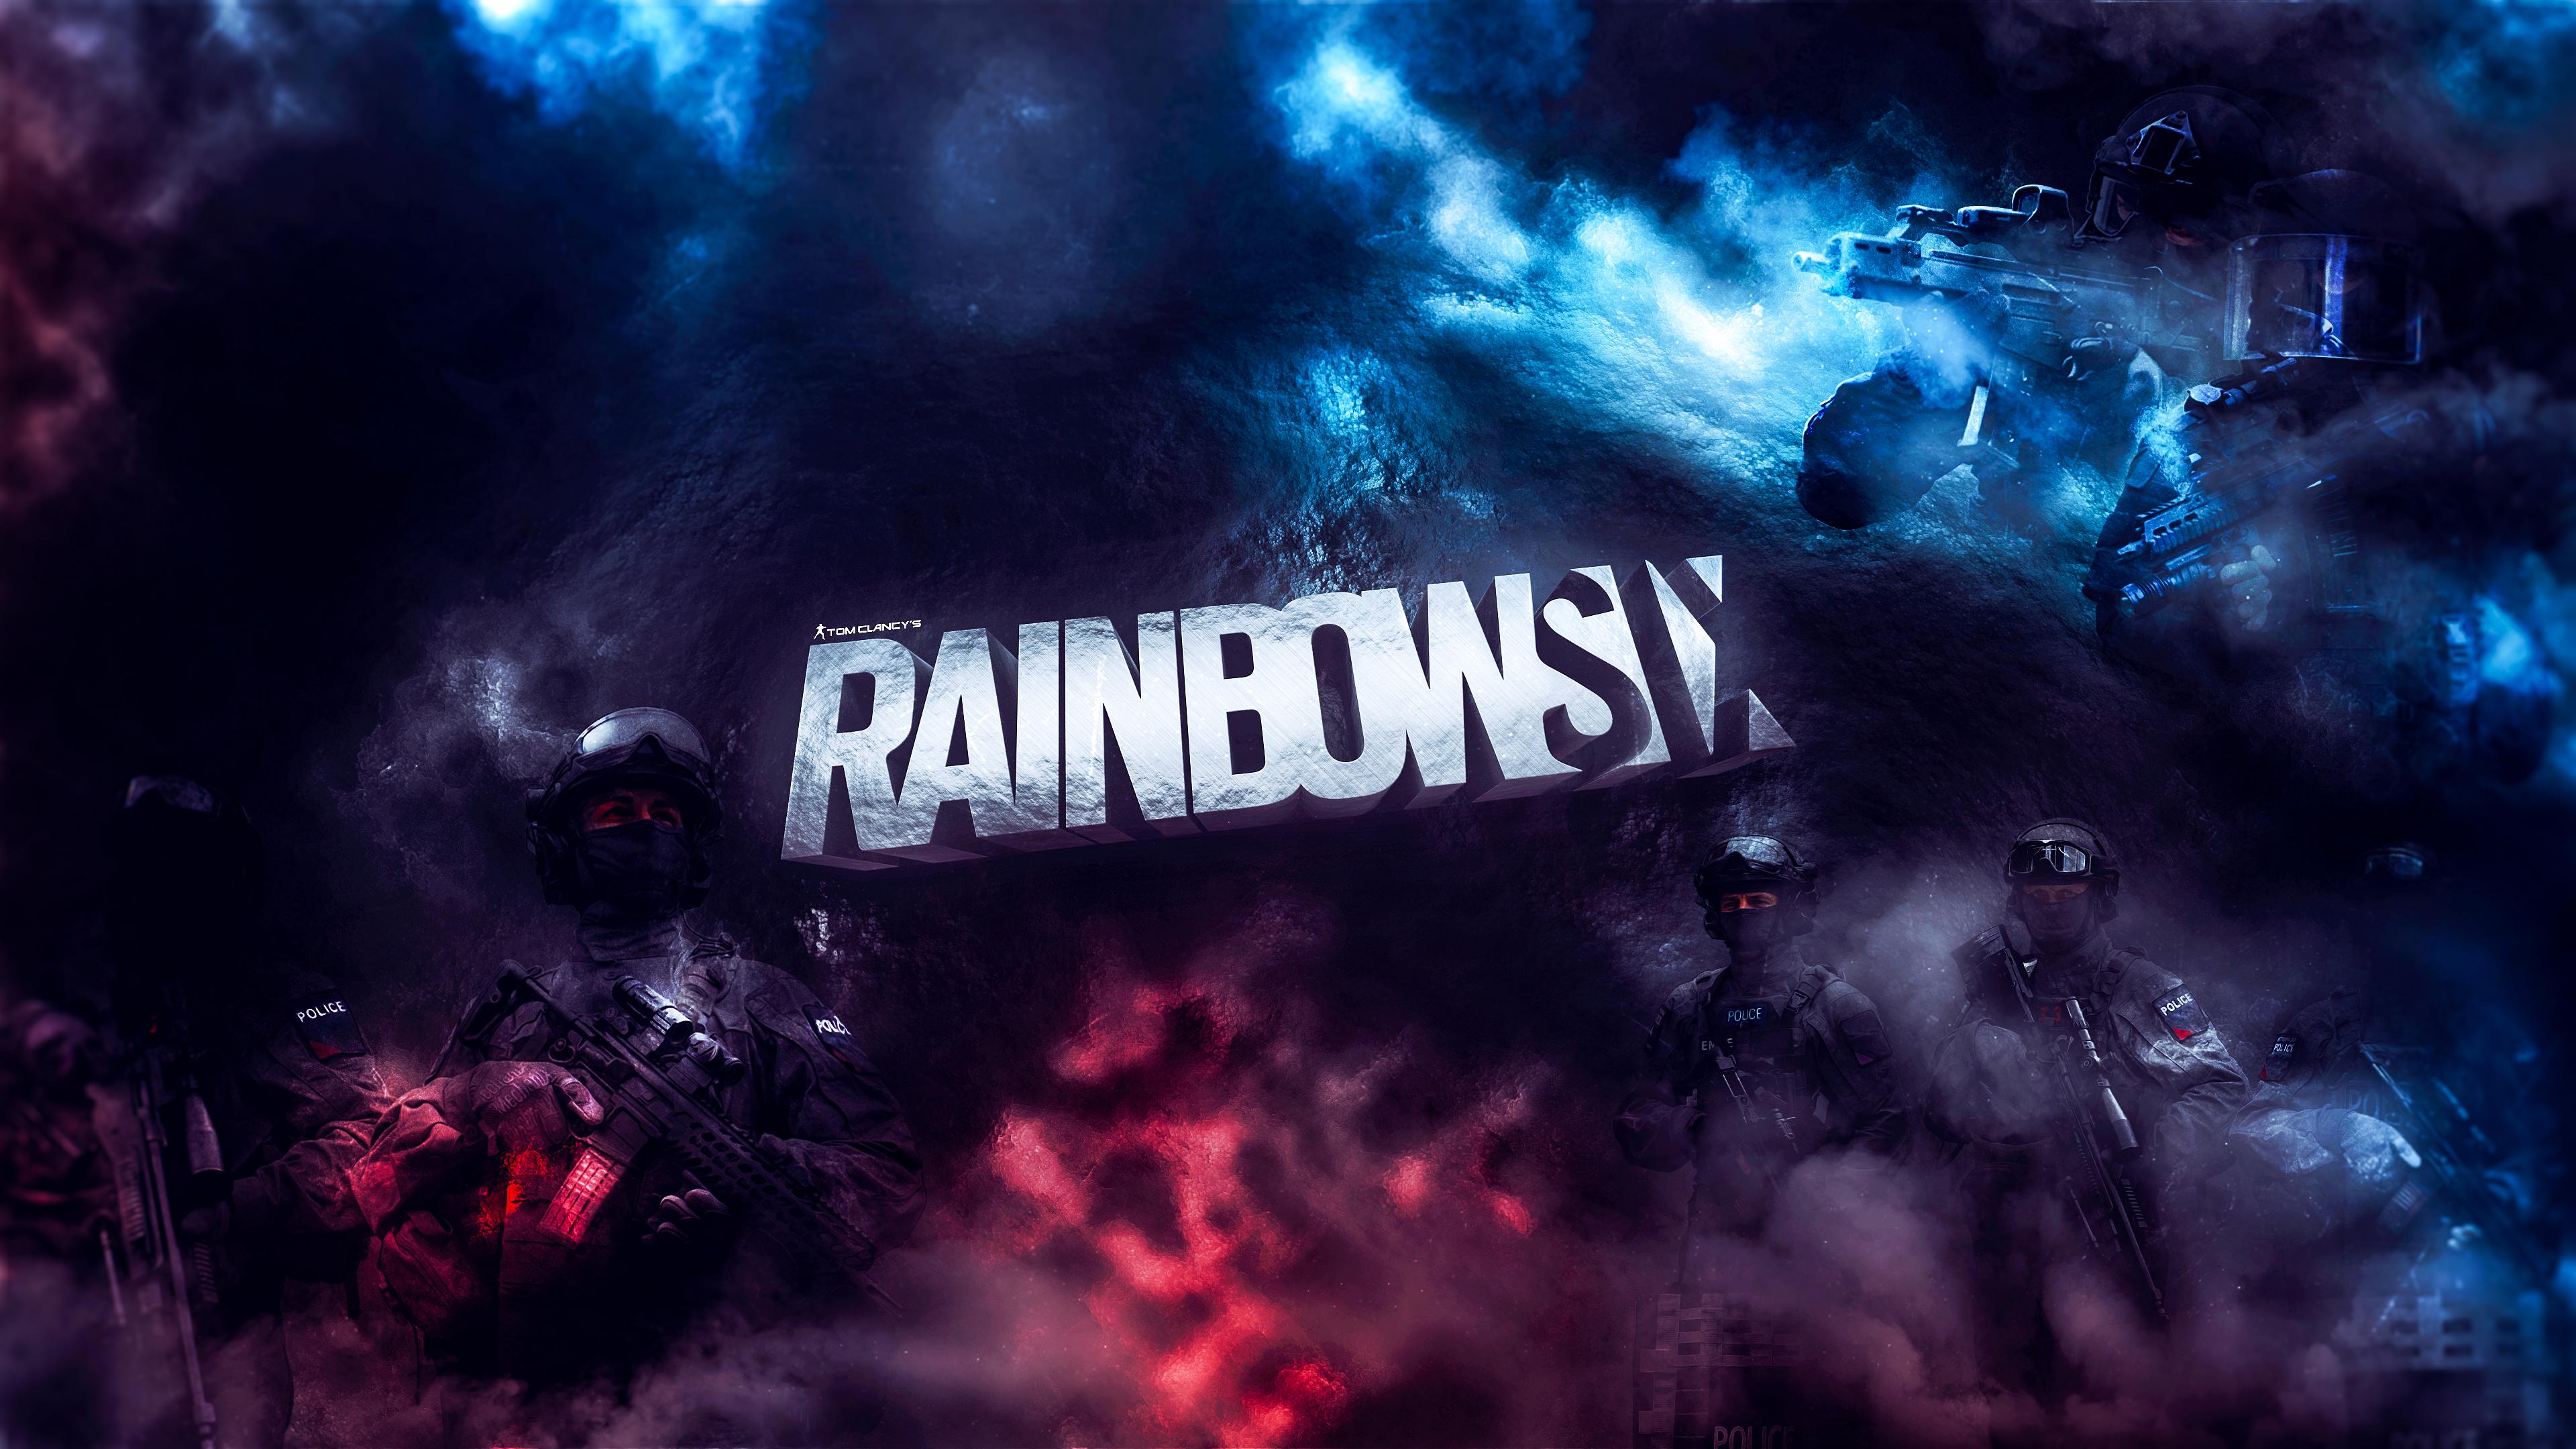 Wallpaper Rainbow 6 Siege Video Games Games Posters Games Art